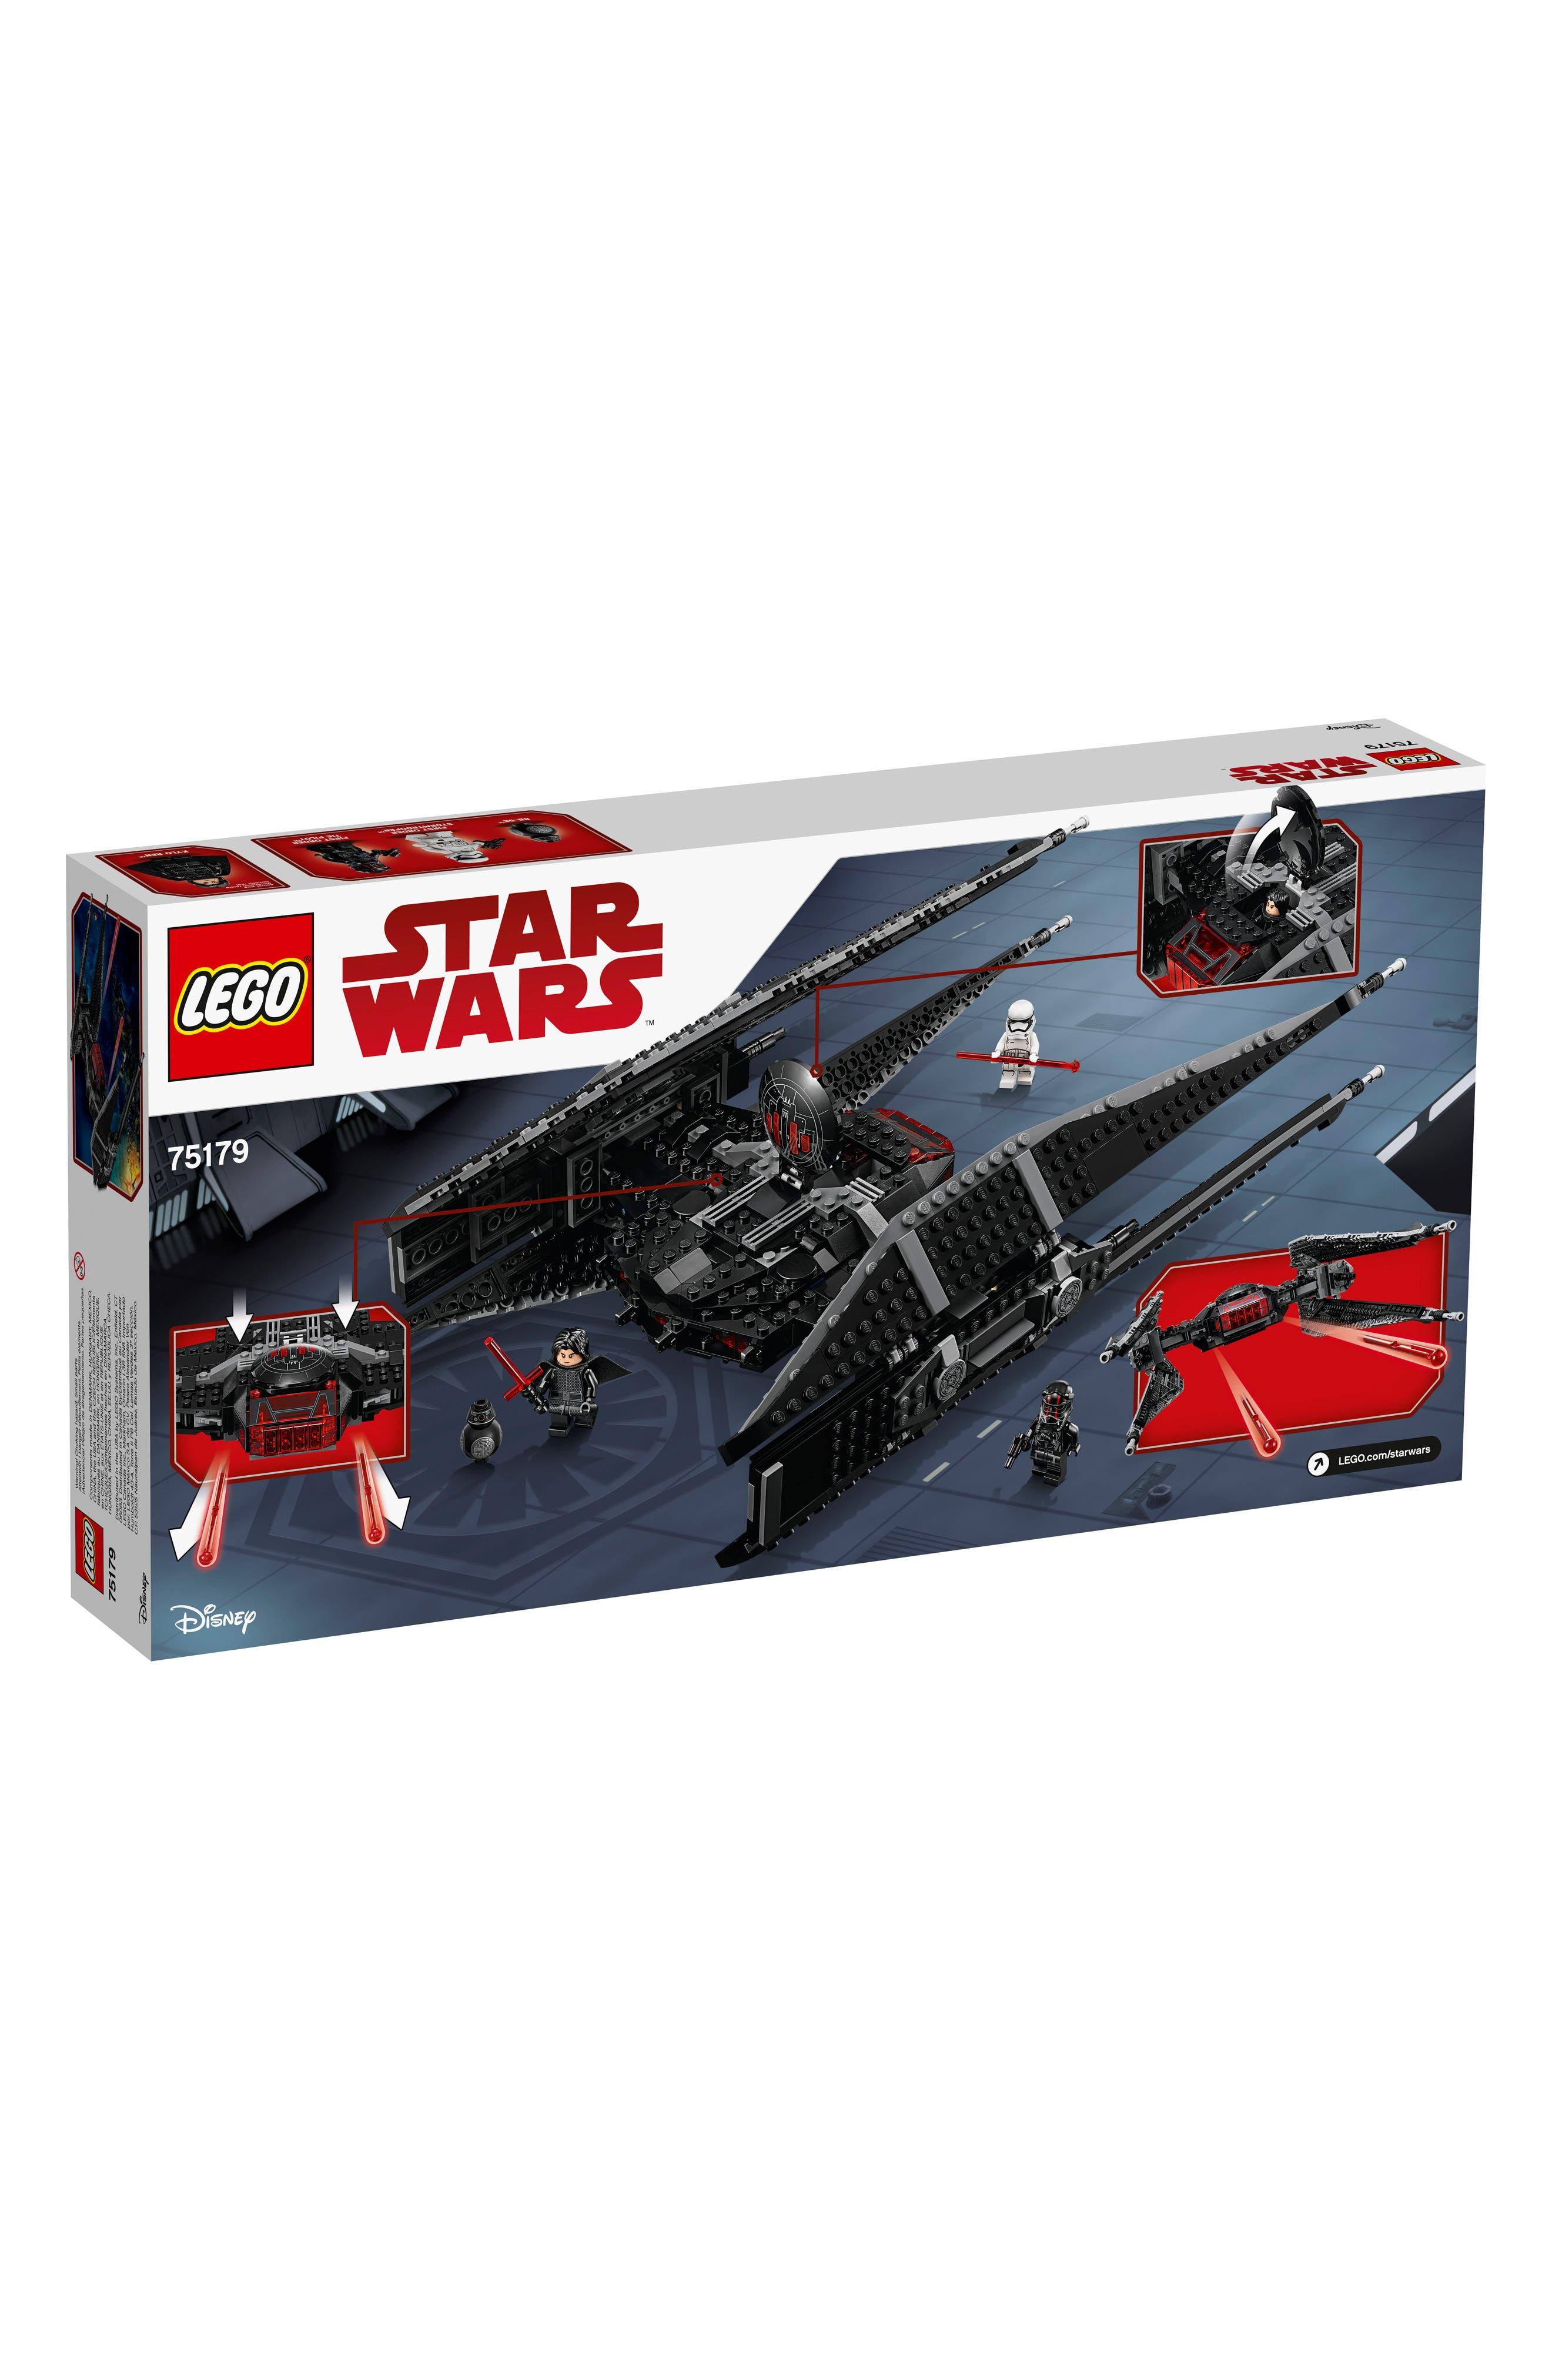 Alternate Image 1 Selected - LEGO® Star Wars™ Kylo Ren's TIE Fighter - 75179